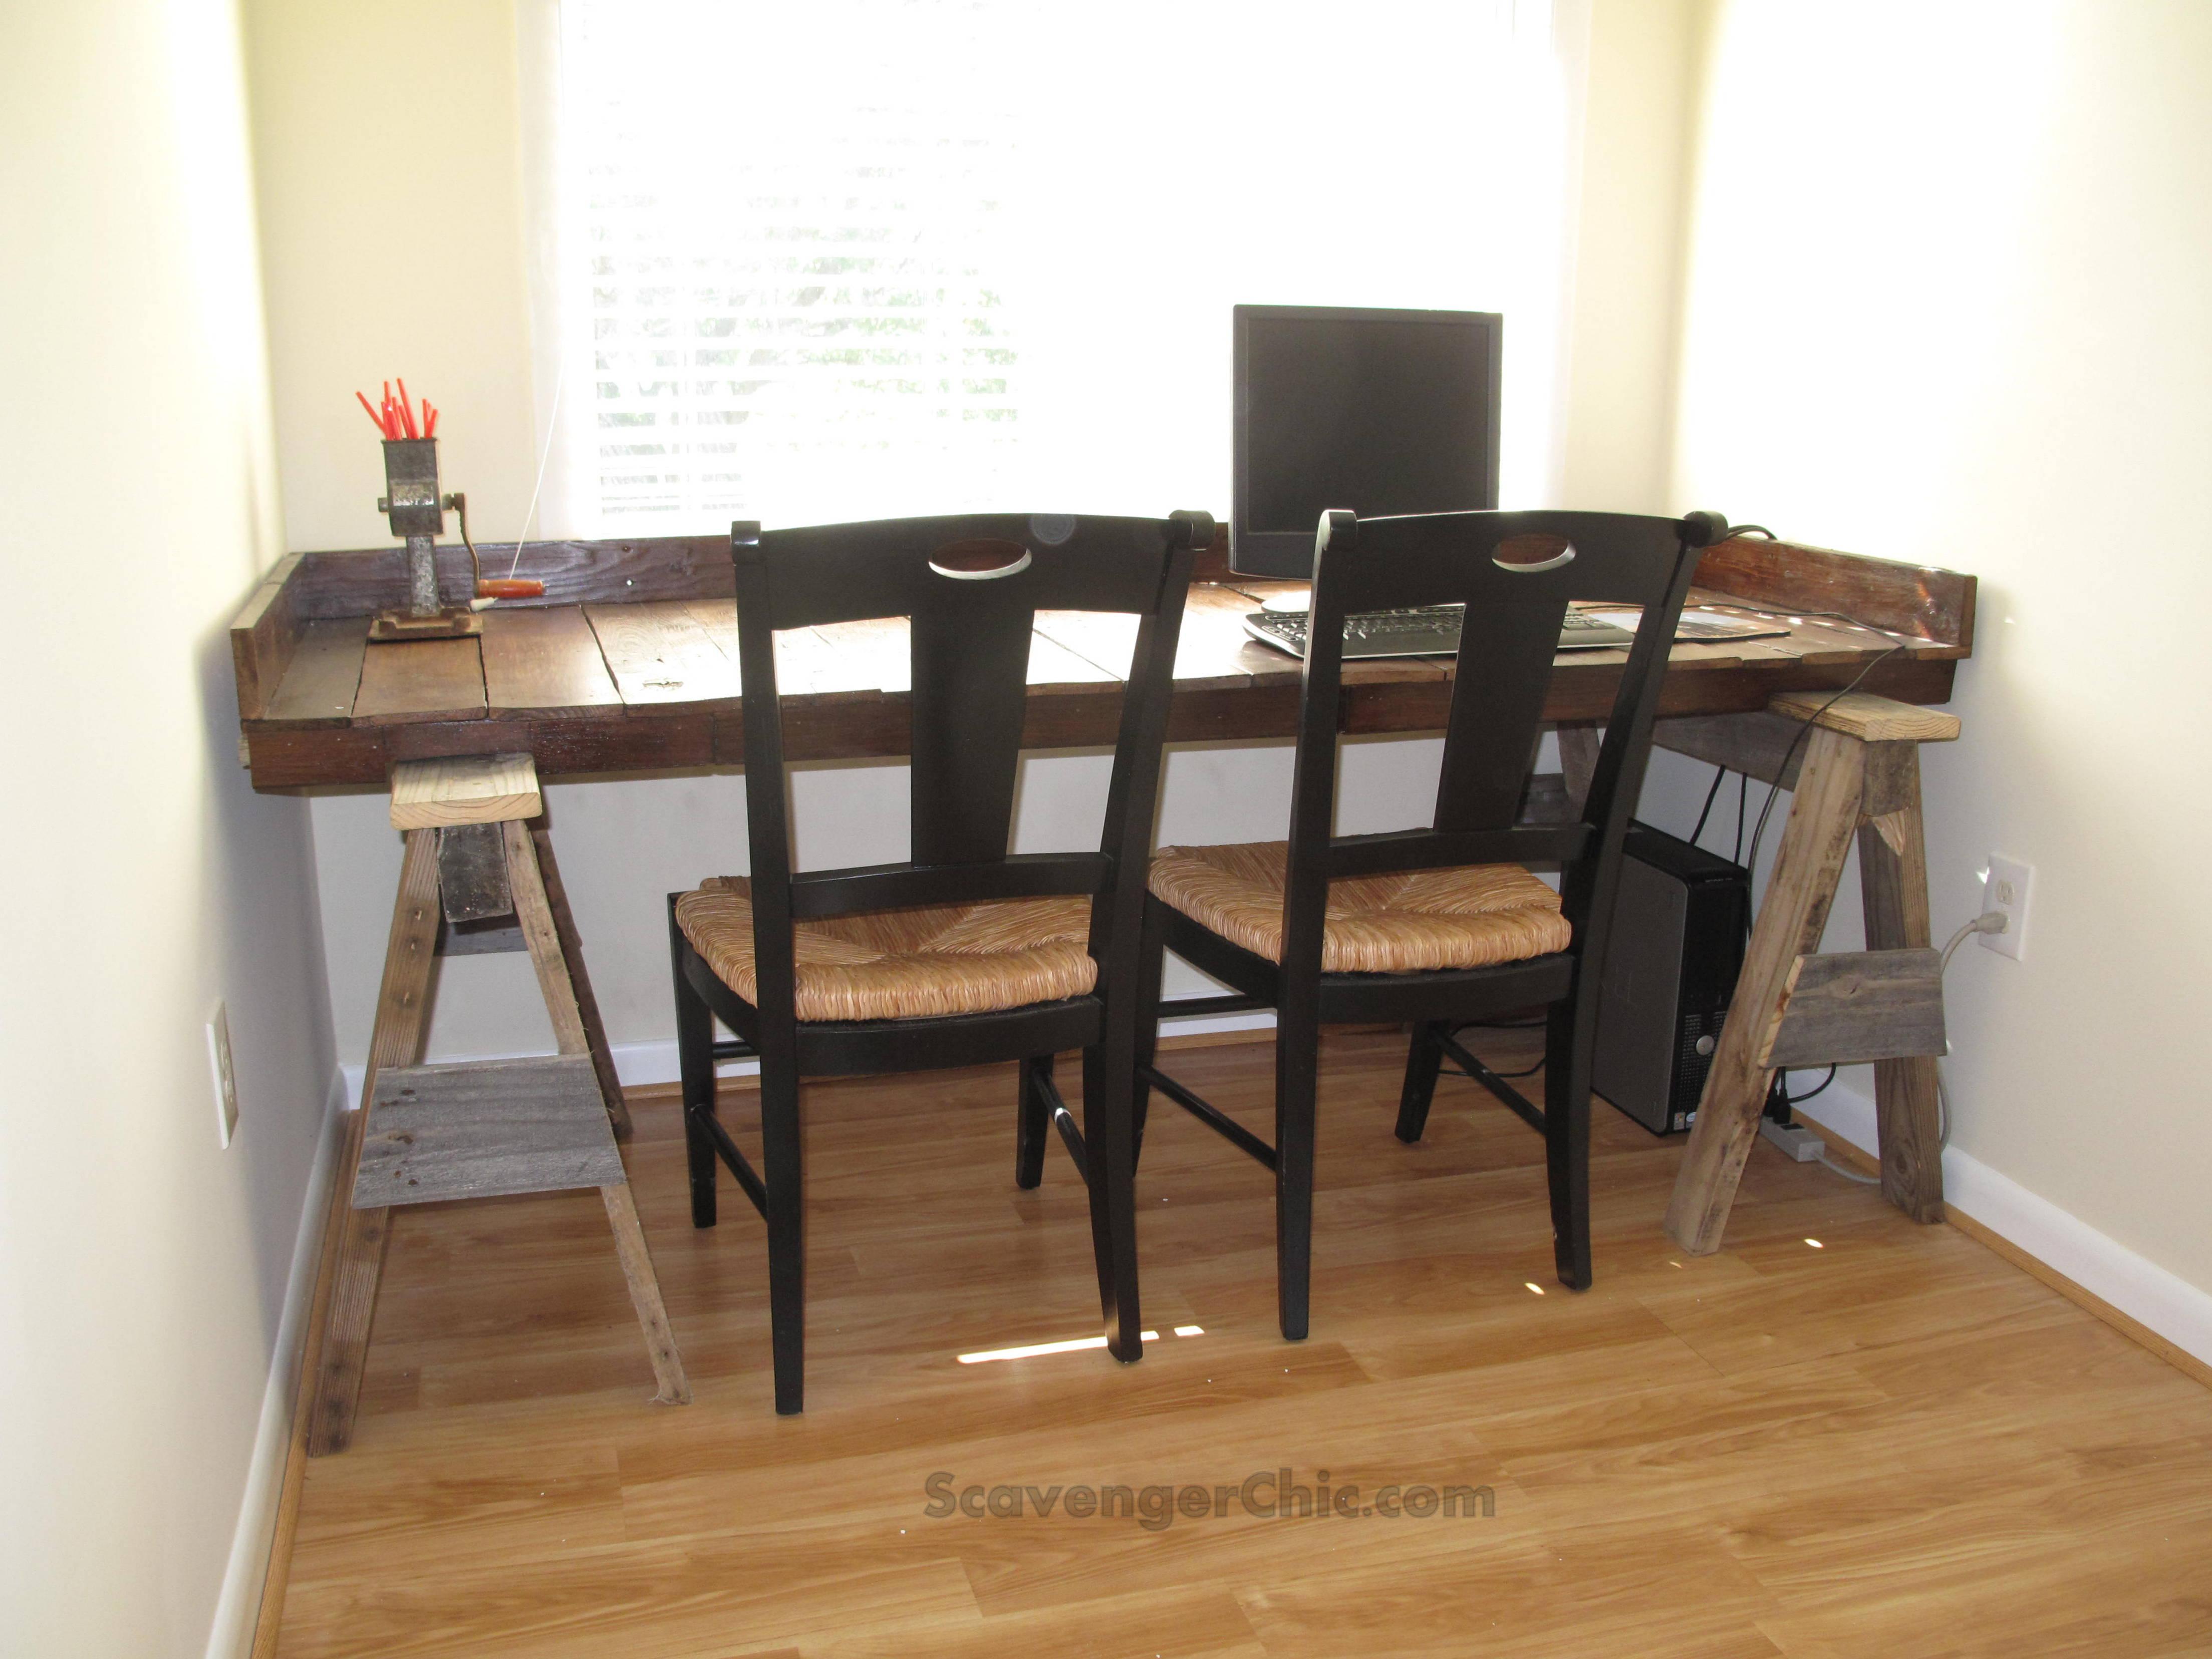 pallet wood sawhorse desk - scavenger chic